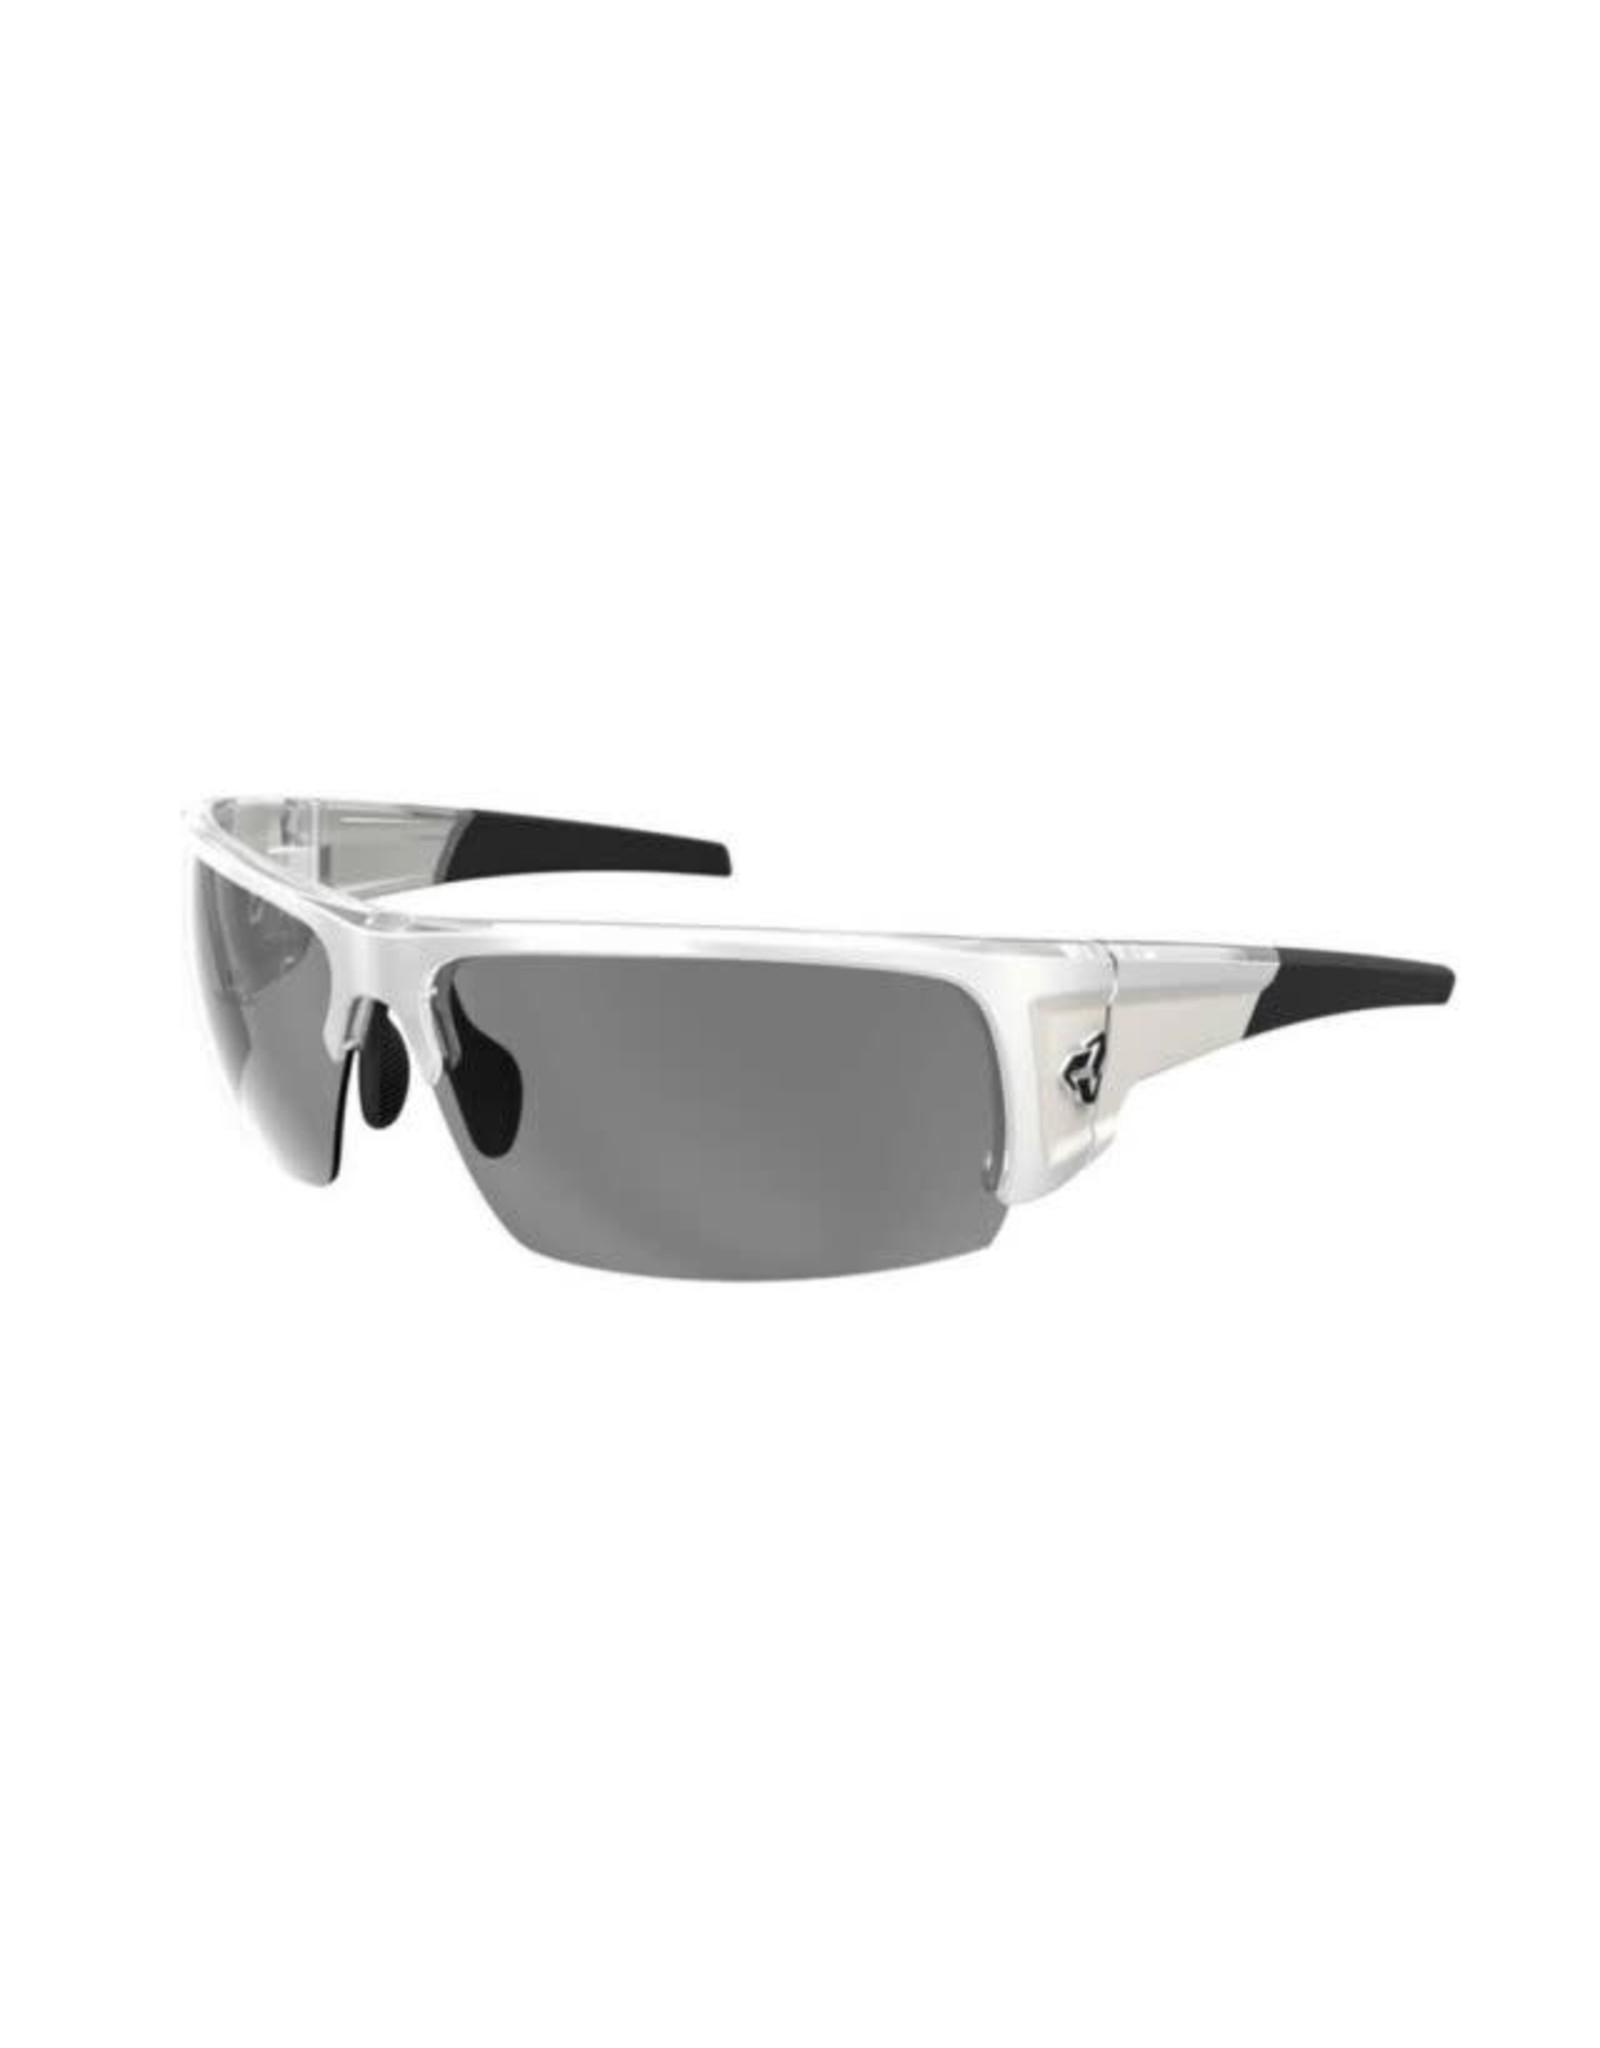 Ryders Caliber Photochromatic Cycling Sunglasses